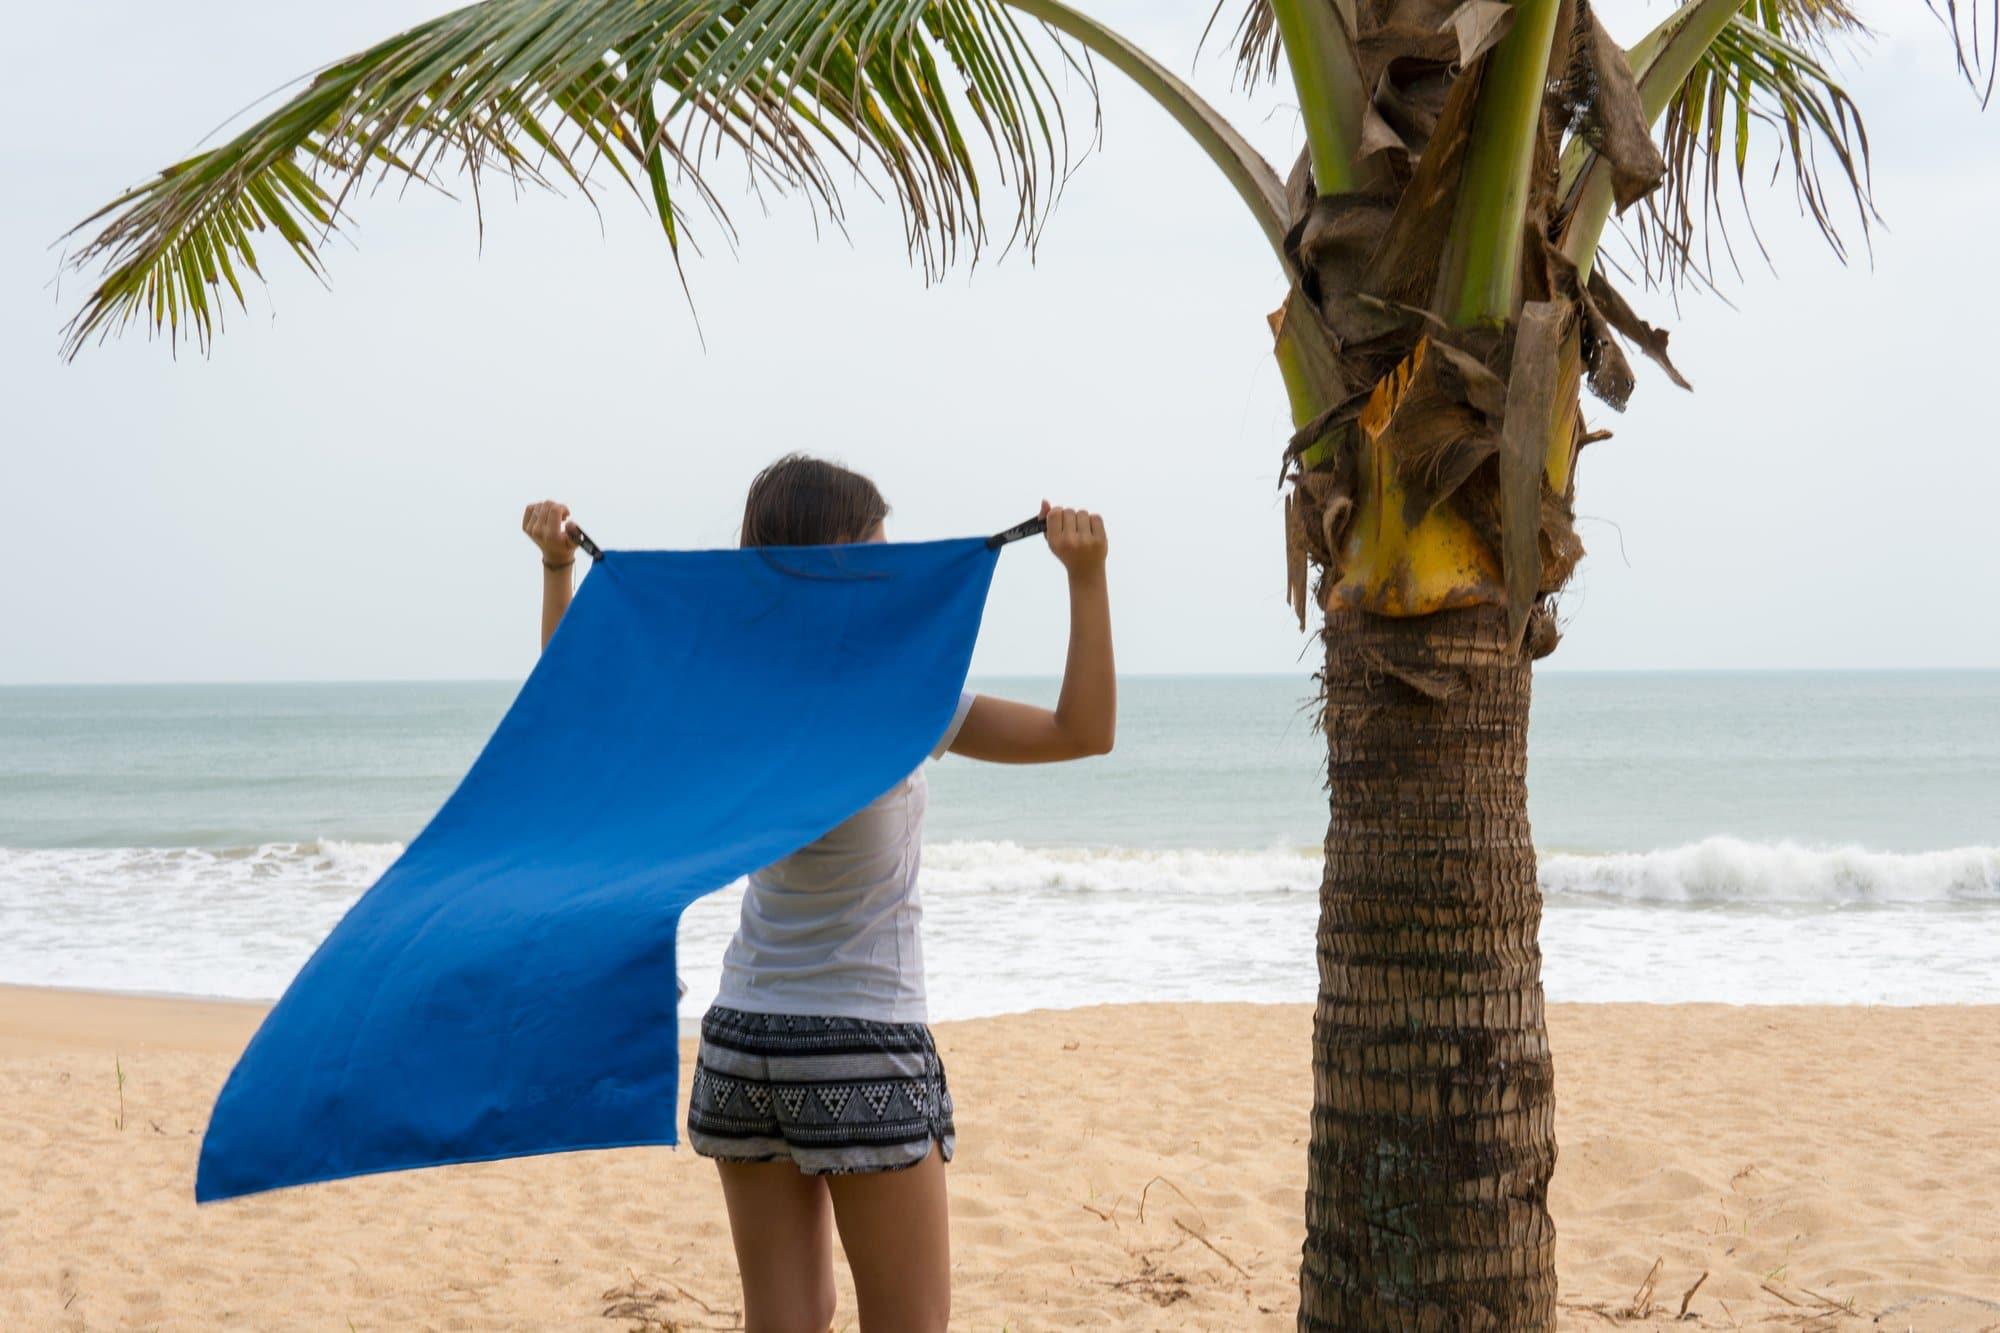 BEARZ Outdoor Microfiber Beach Towel